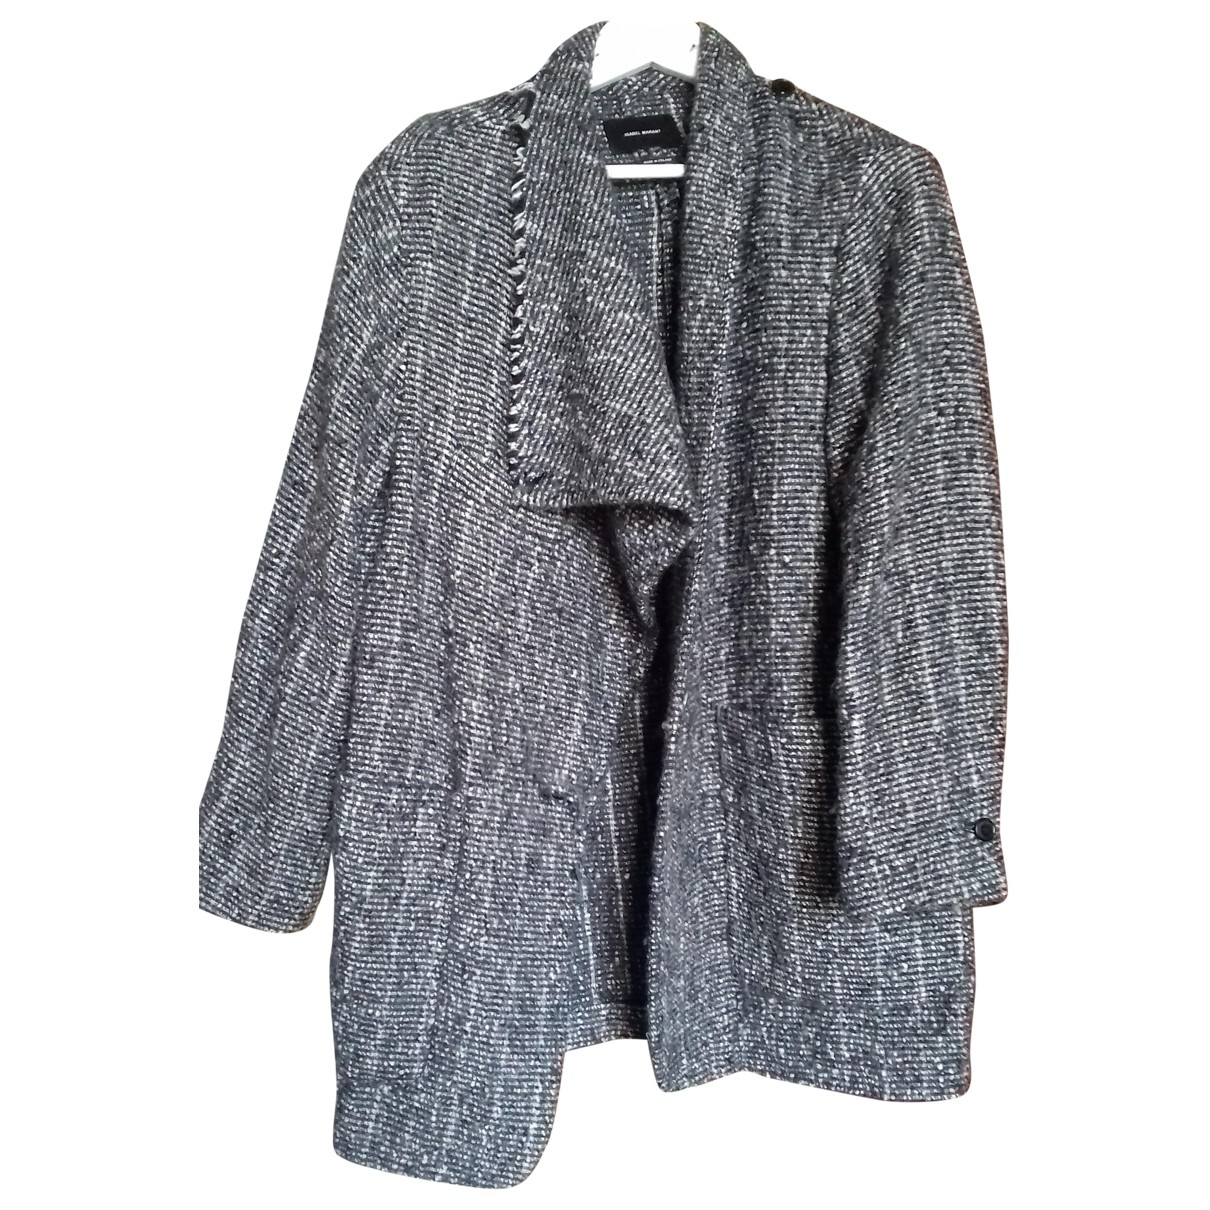 Isabel Marant \N Grey Wool coat for Women 36 FR